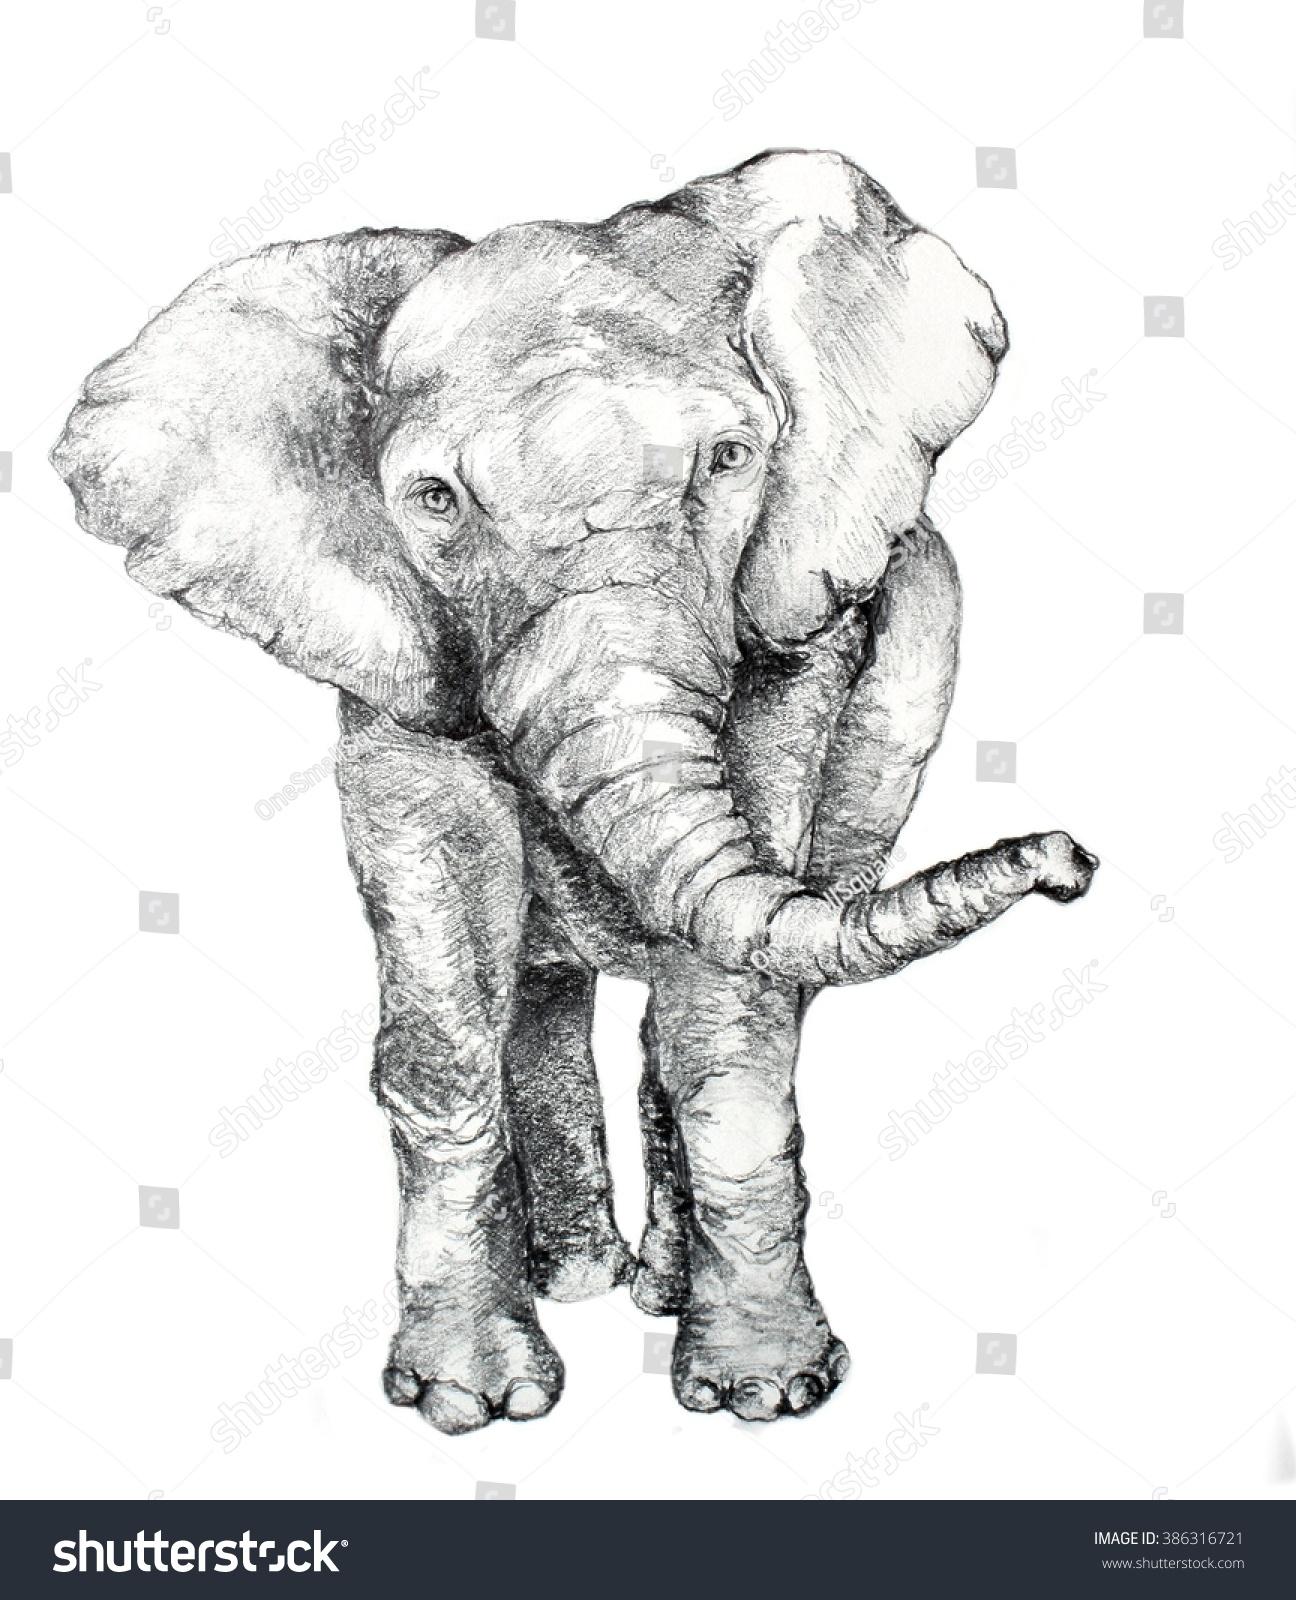 Original hand drawn elephant sketch in pencil